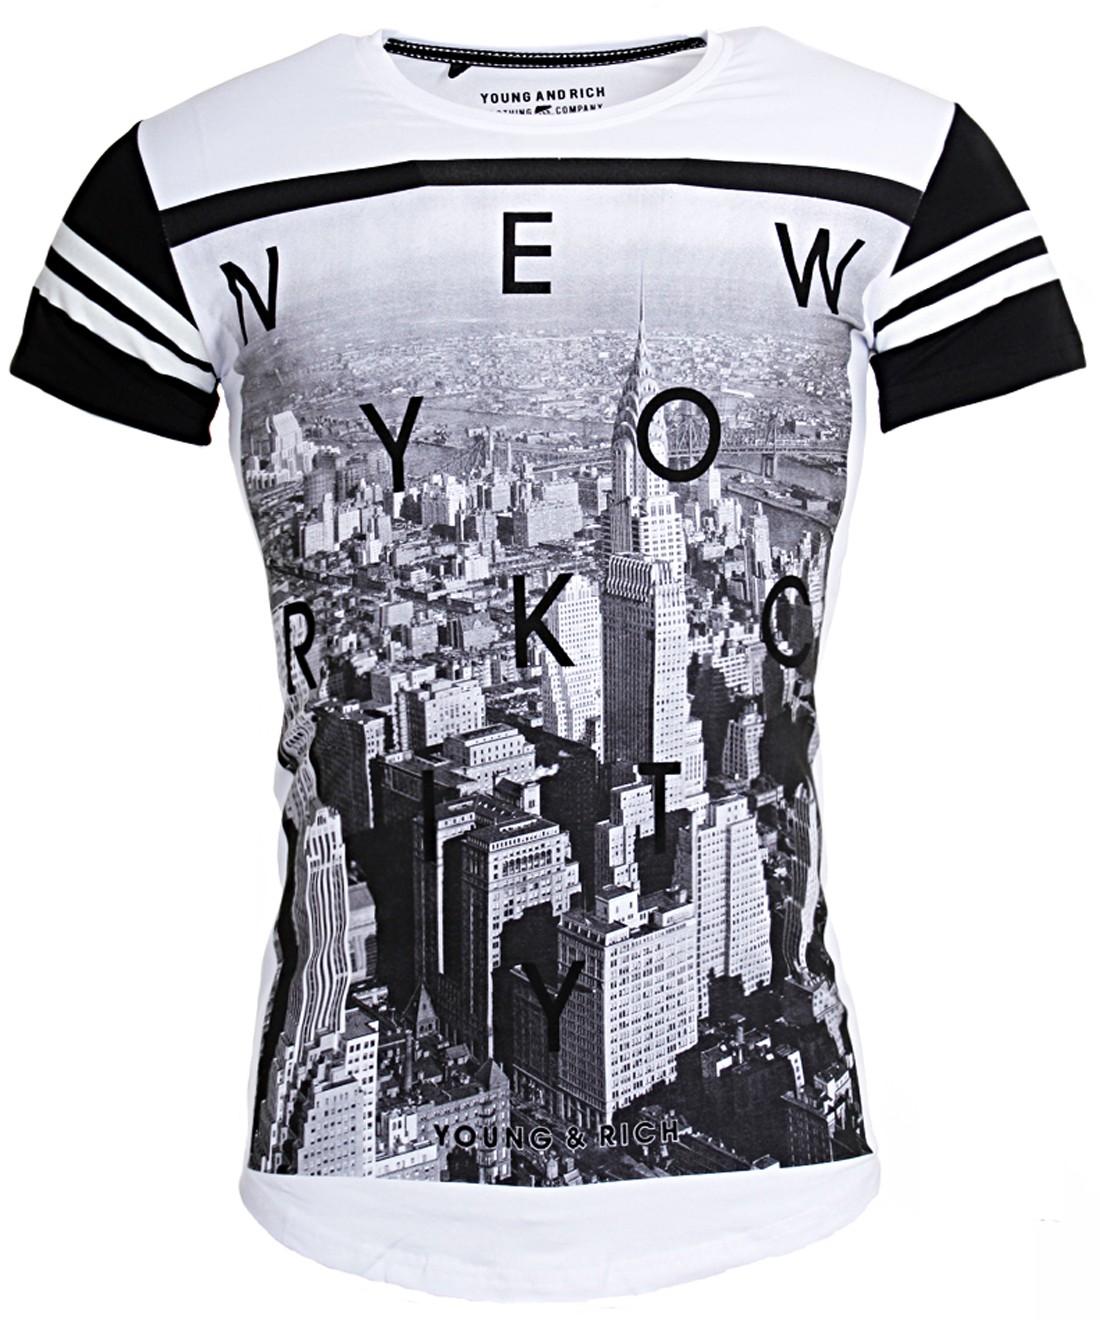 young rich oversized herren t shirt lange passform newyork print slim fit 1907 ebay. Black Bedroom Furniture Sets. Home Design Ideas